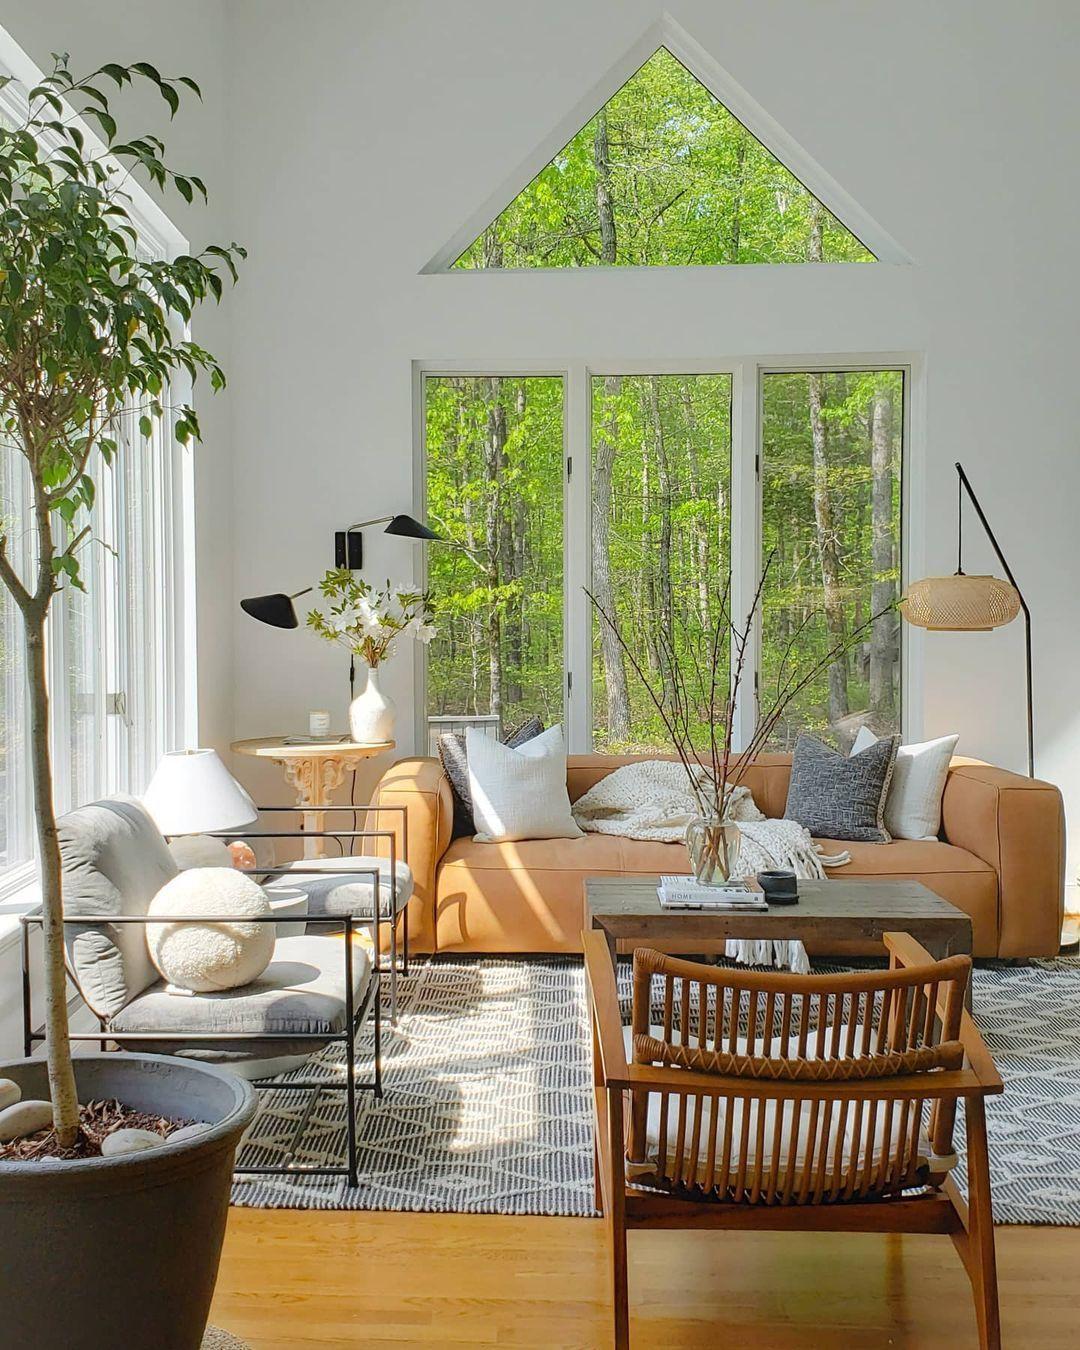 19 Tiny House Interior Ideas & Design Tips